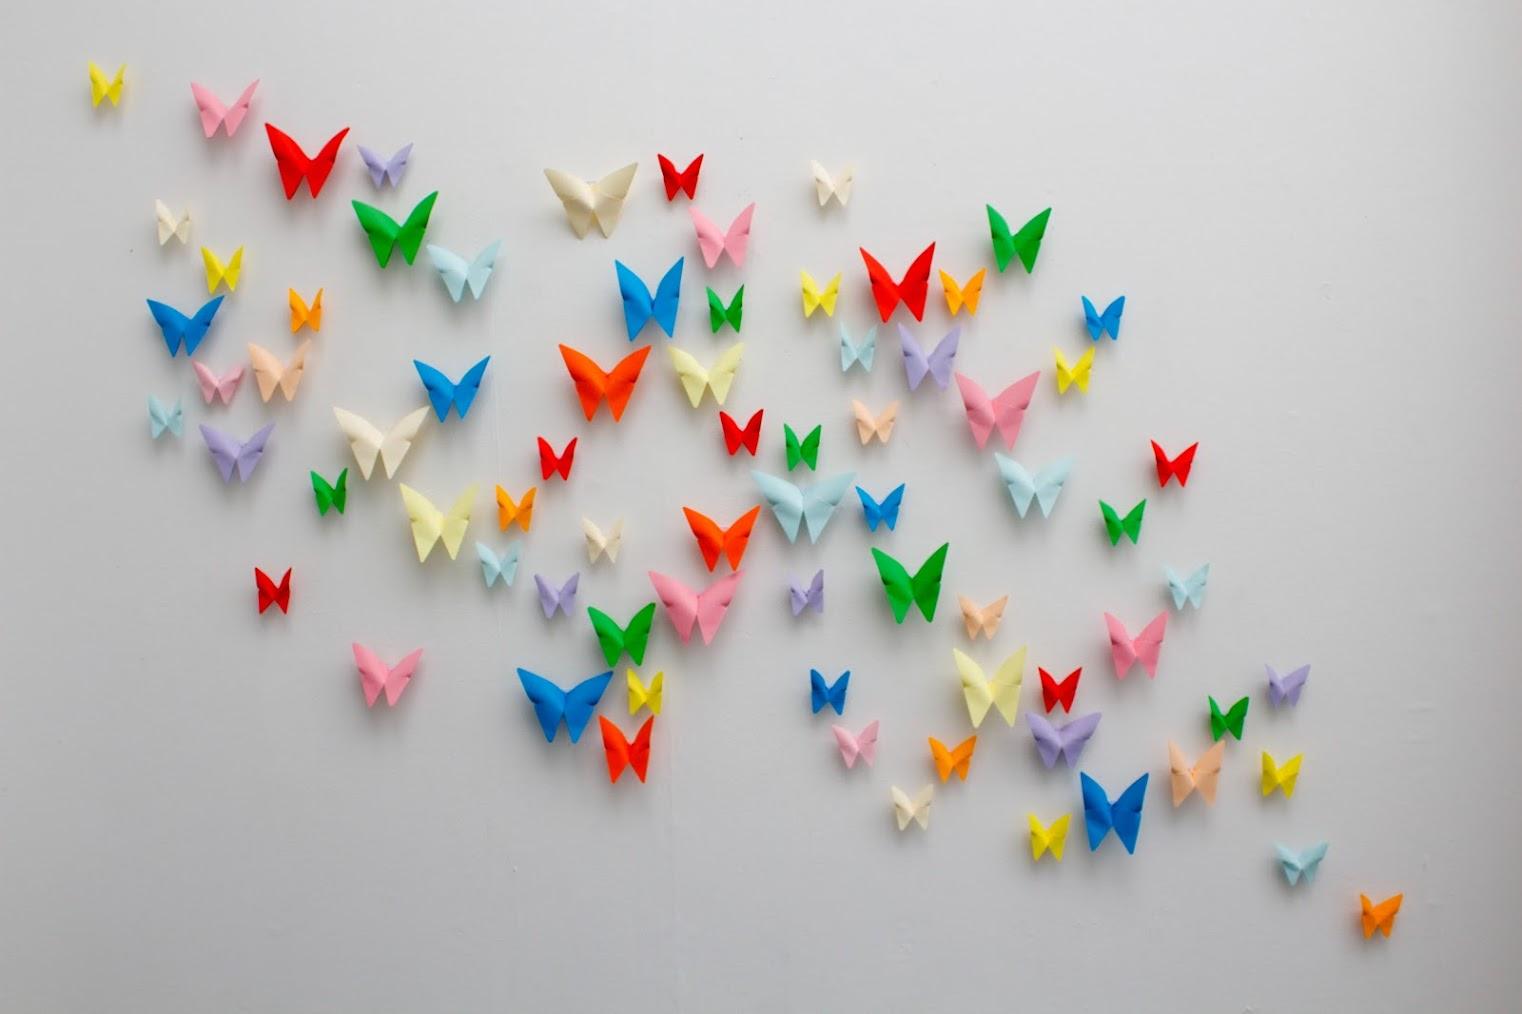 Origami Ninja Star : How To Make 8 Pointed Ninja Star For Kids! | 1014x1522